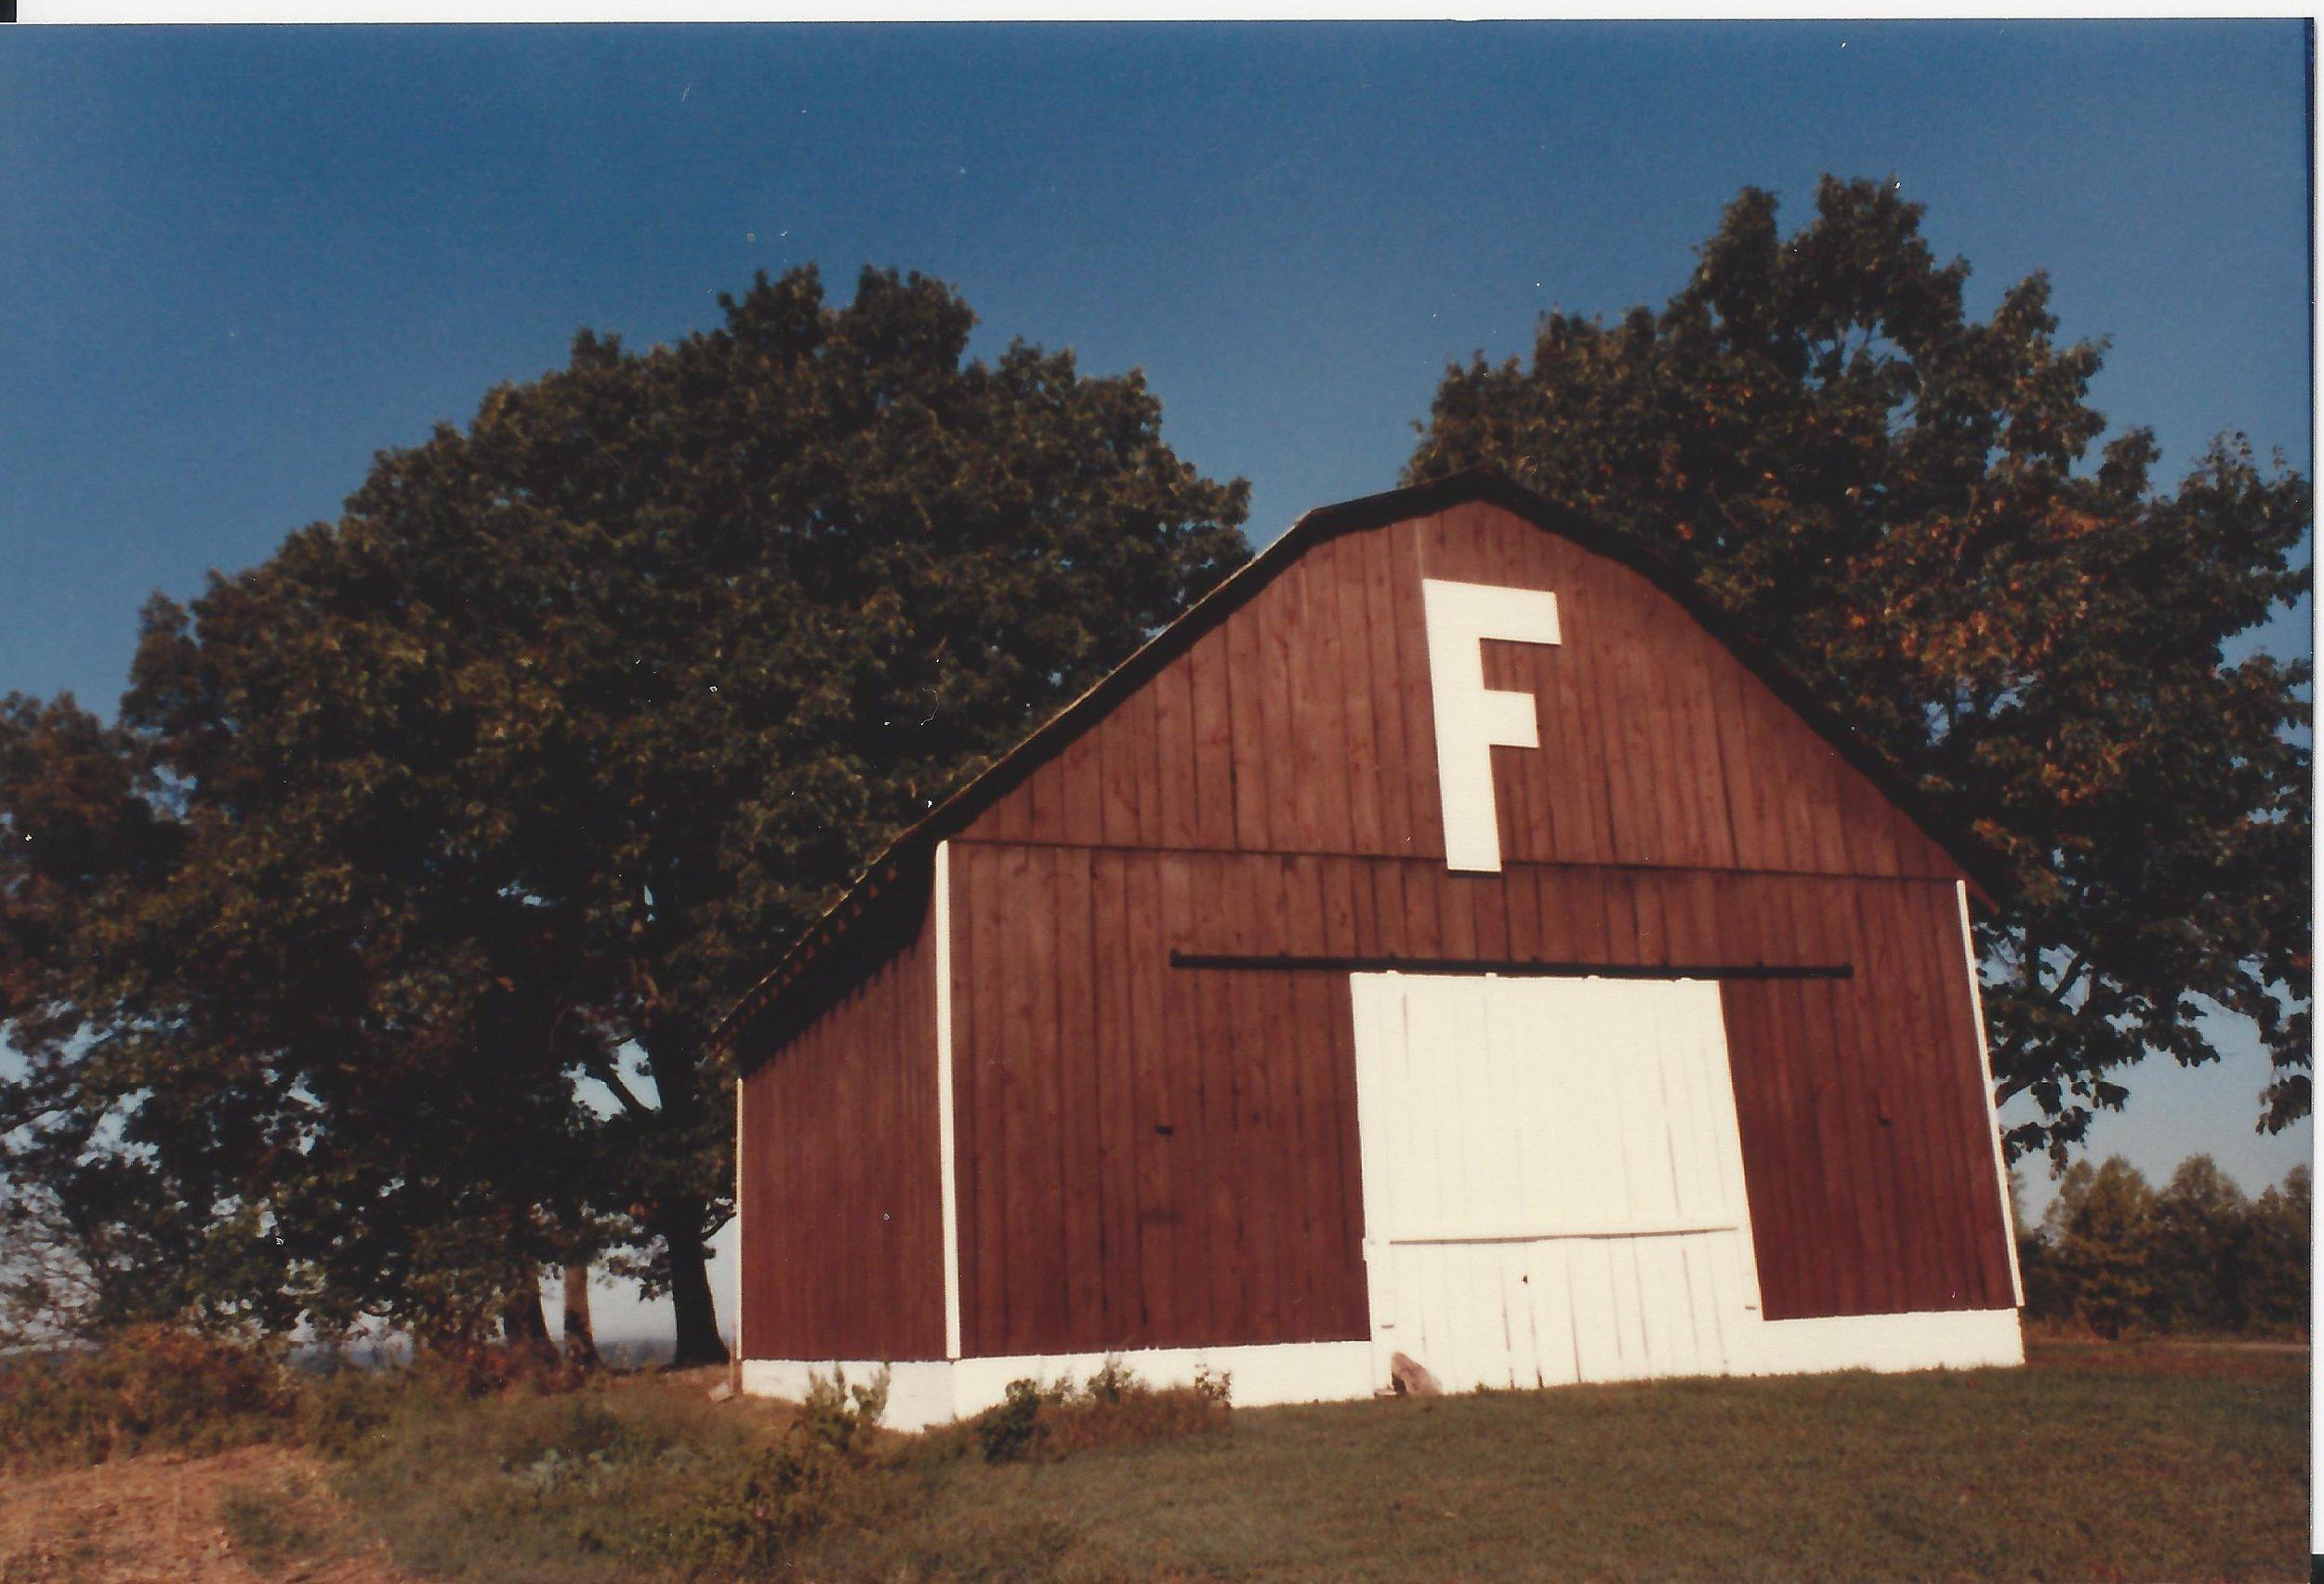 The Flynt Barn